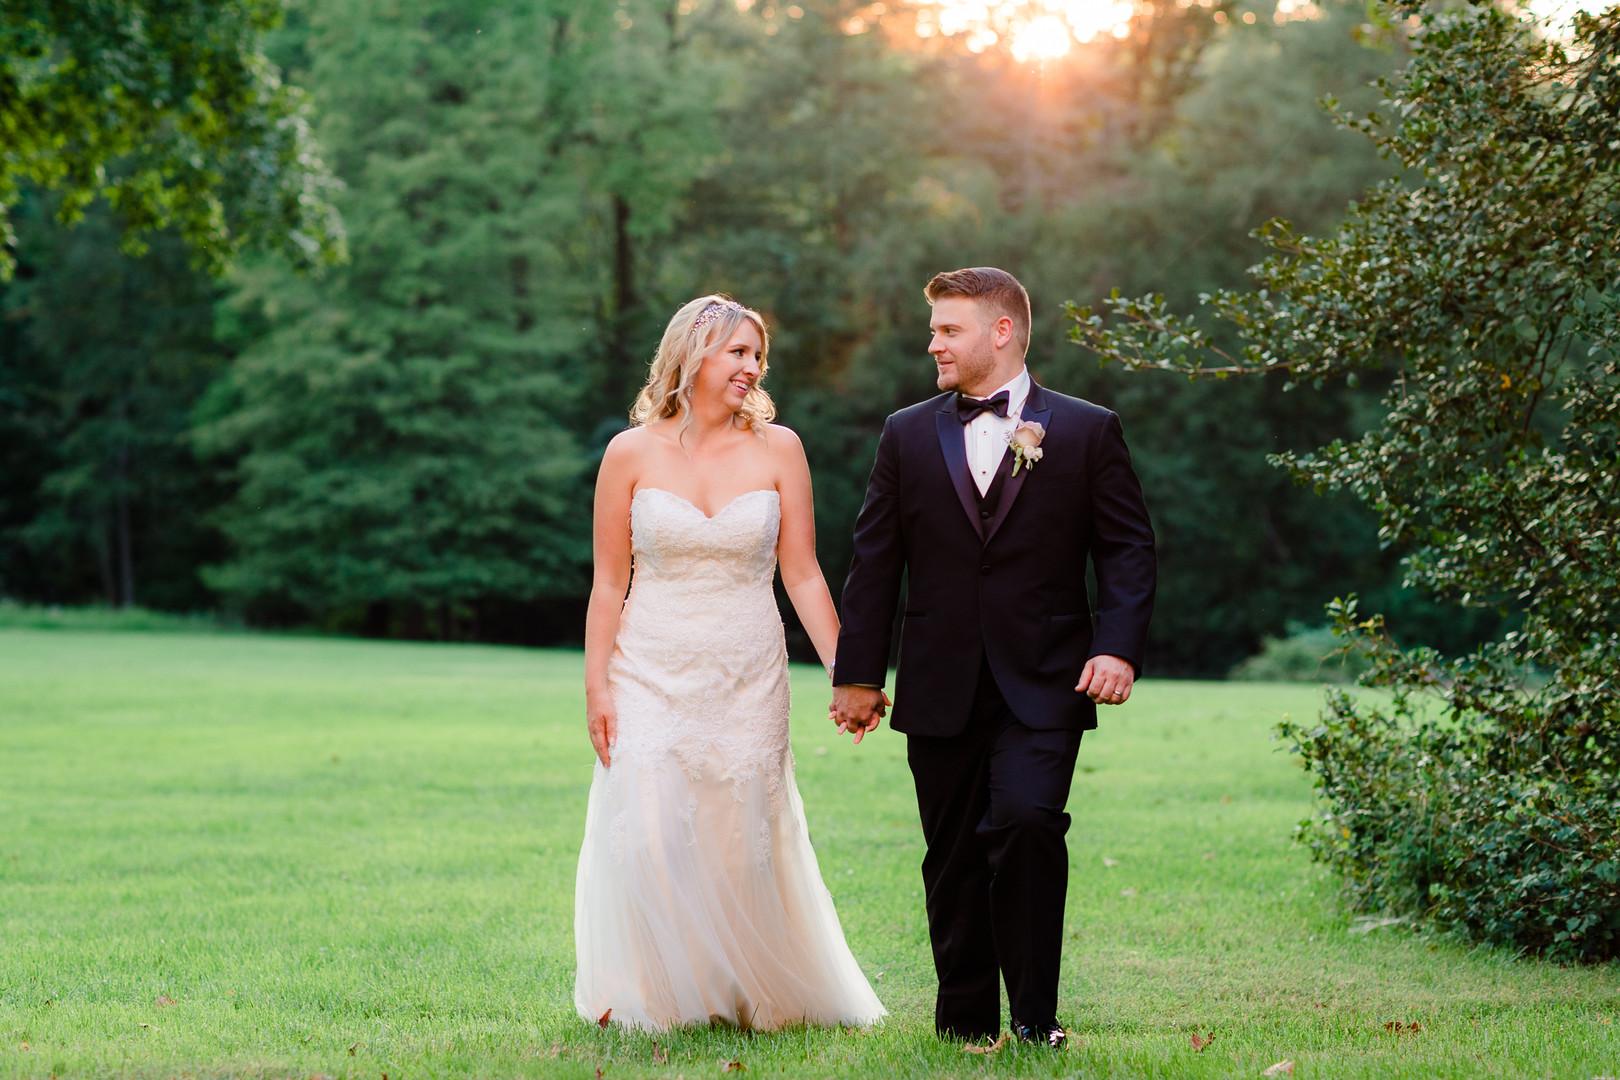 Maryland_Wedding_Photographer08.jpg